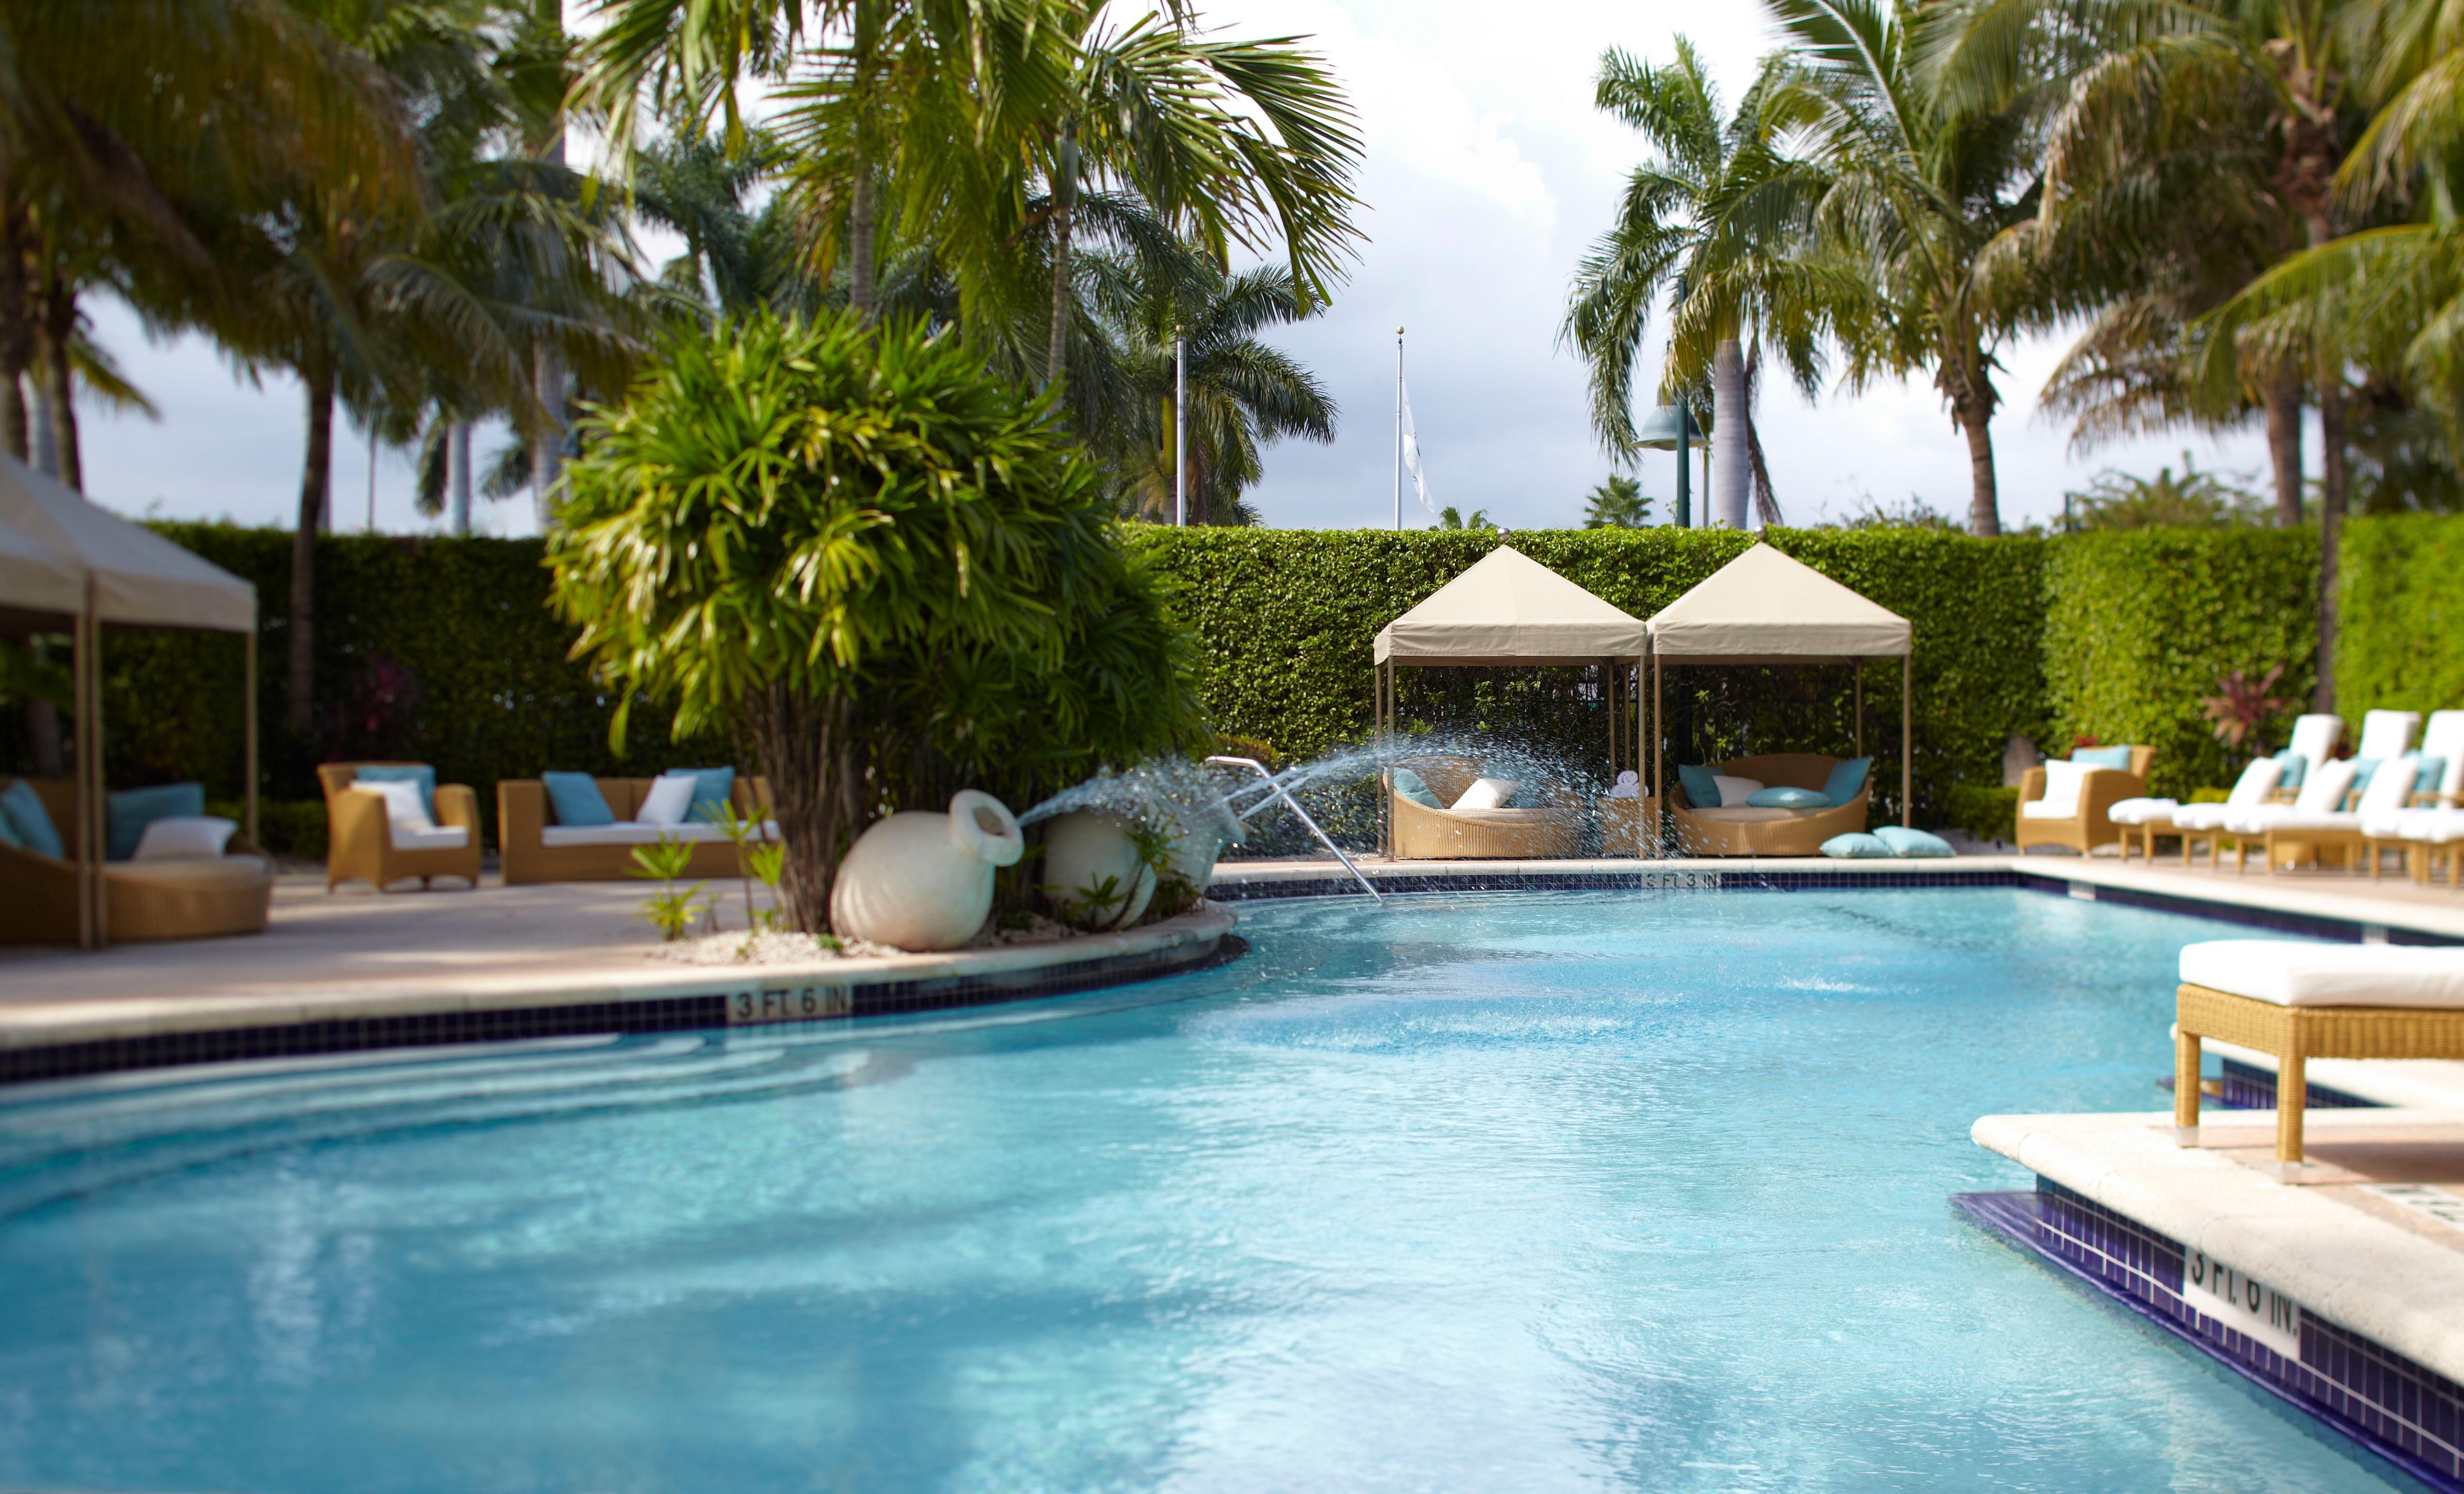 Renaissance Fort Lauderdale Cruise Port Hotel image 1